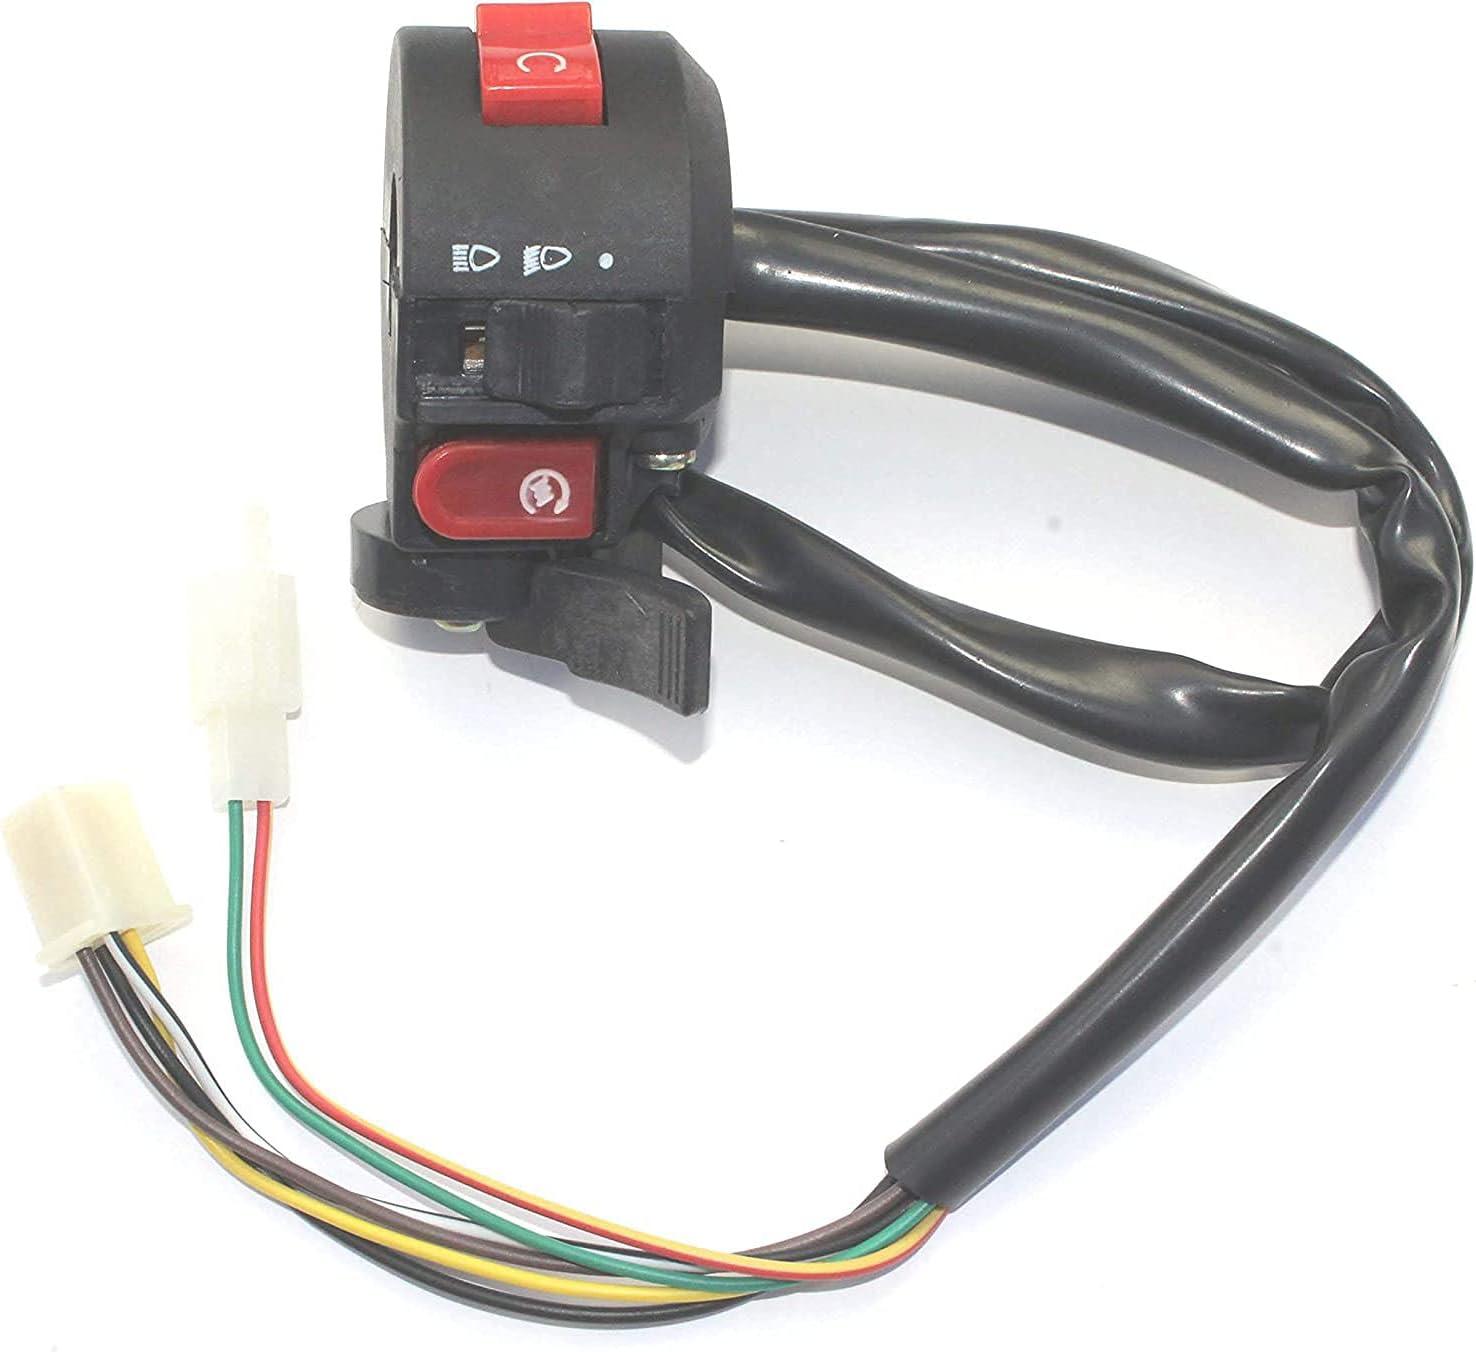 3 Function 8 Wire Kill Light Starter Switch For 7//8 Handlebar ATV 50cc 90cc 110cc 125cc Chinese Taotao Sunl Roketa